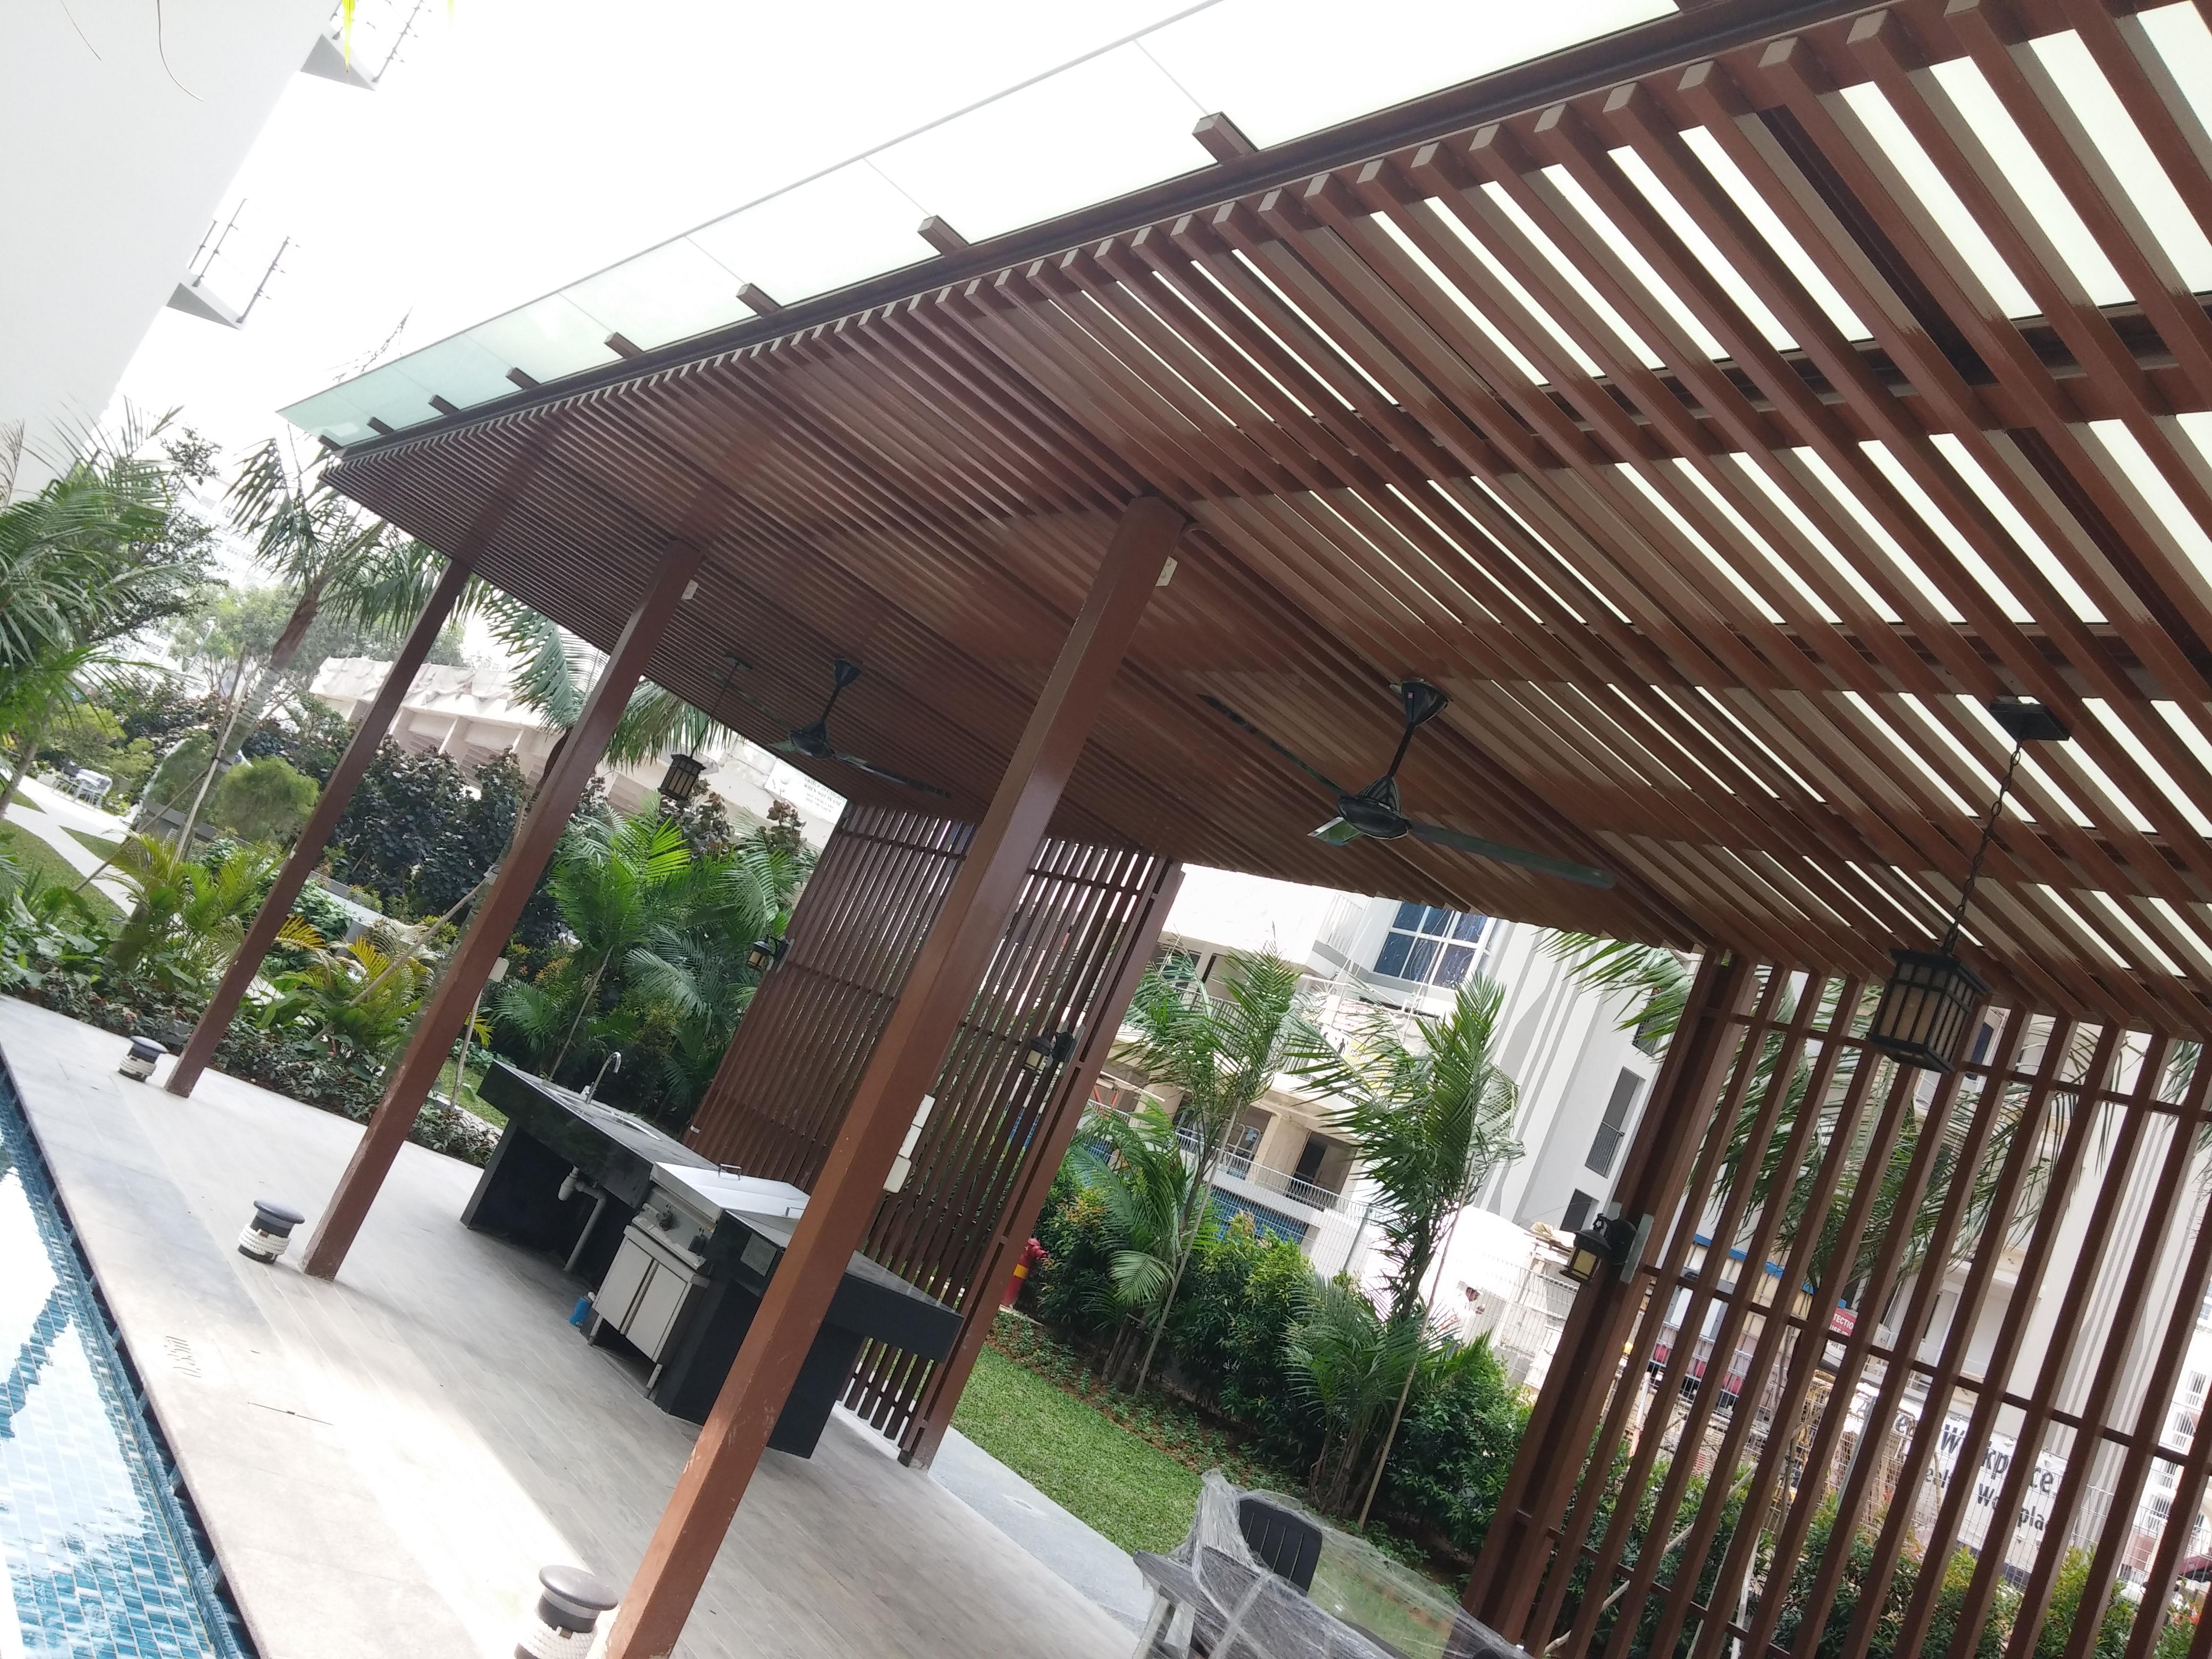 Boathouse - Glass Canopy Trellis & GALLERY